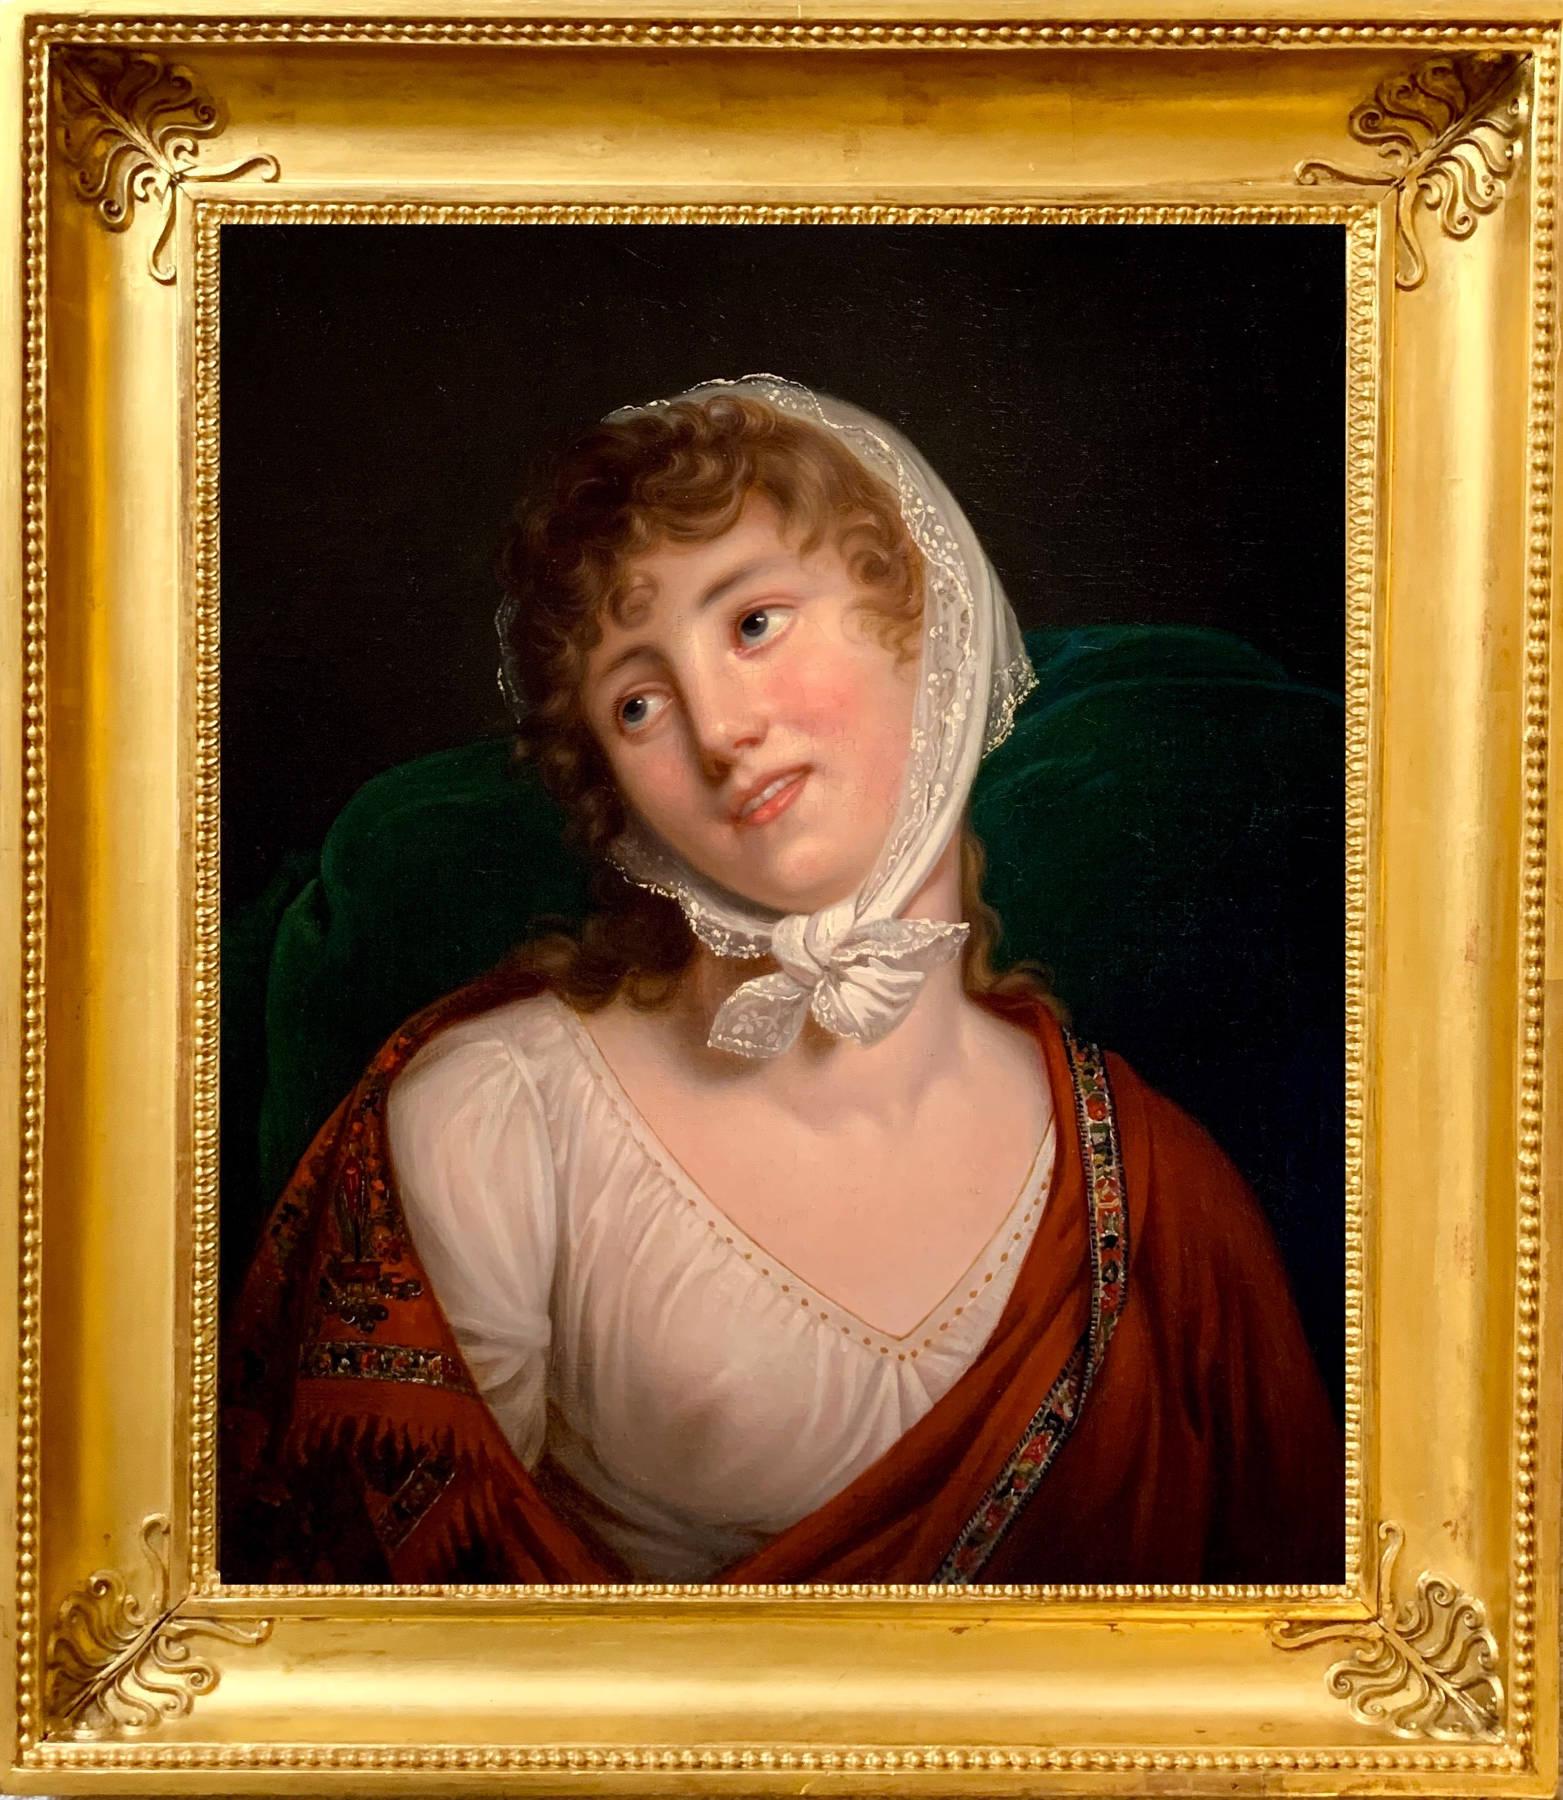 Portrait de Marie Walewska par Robert Lefevre